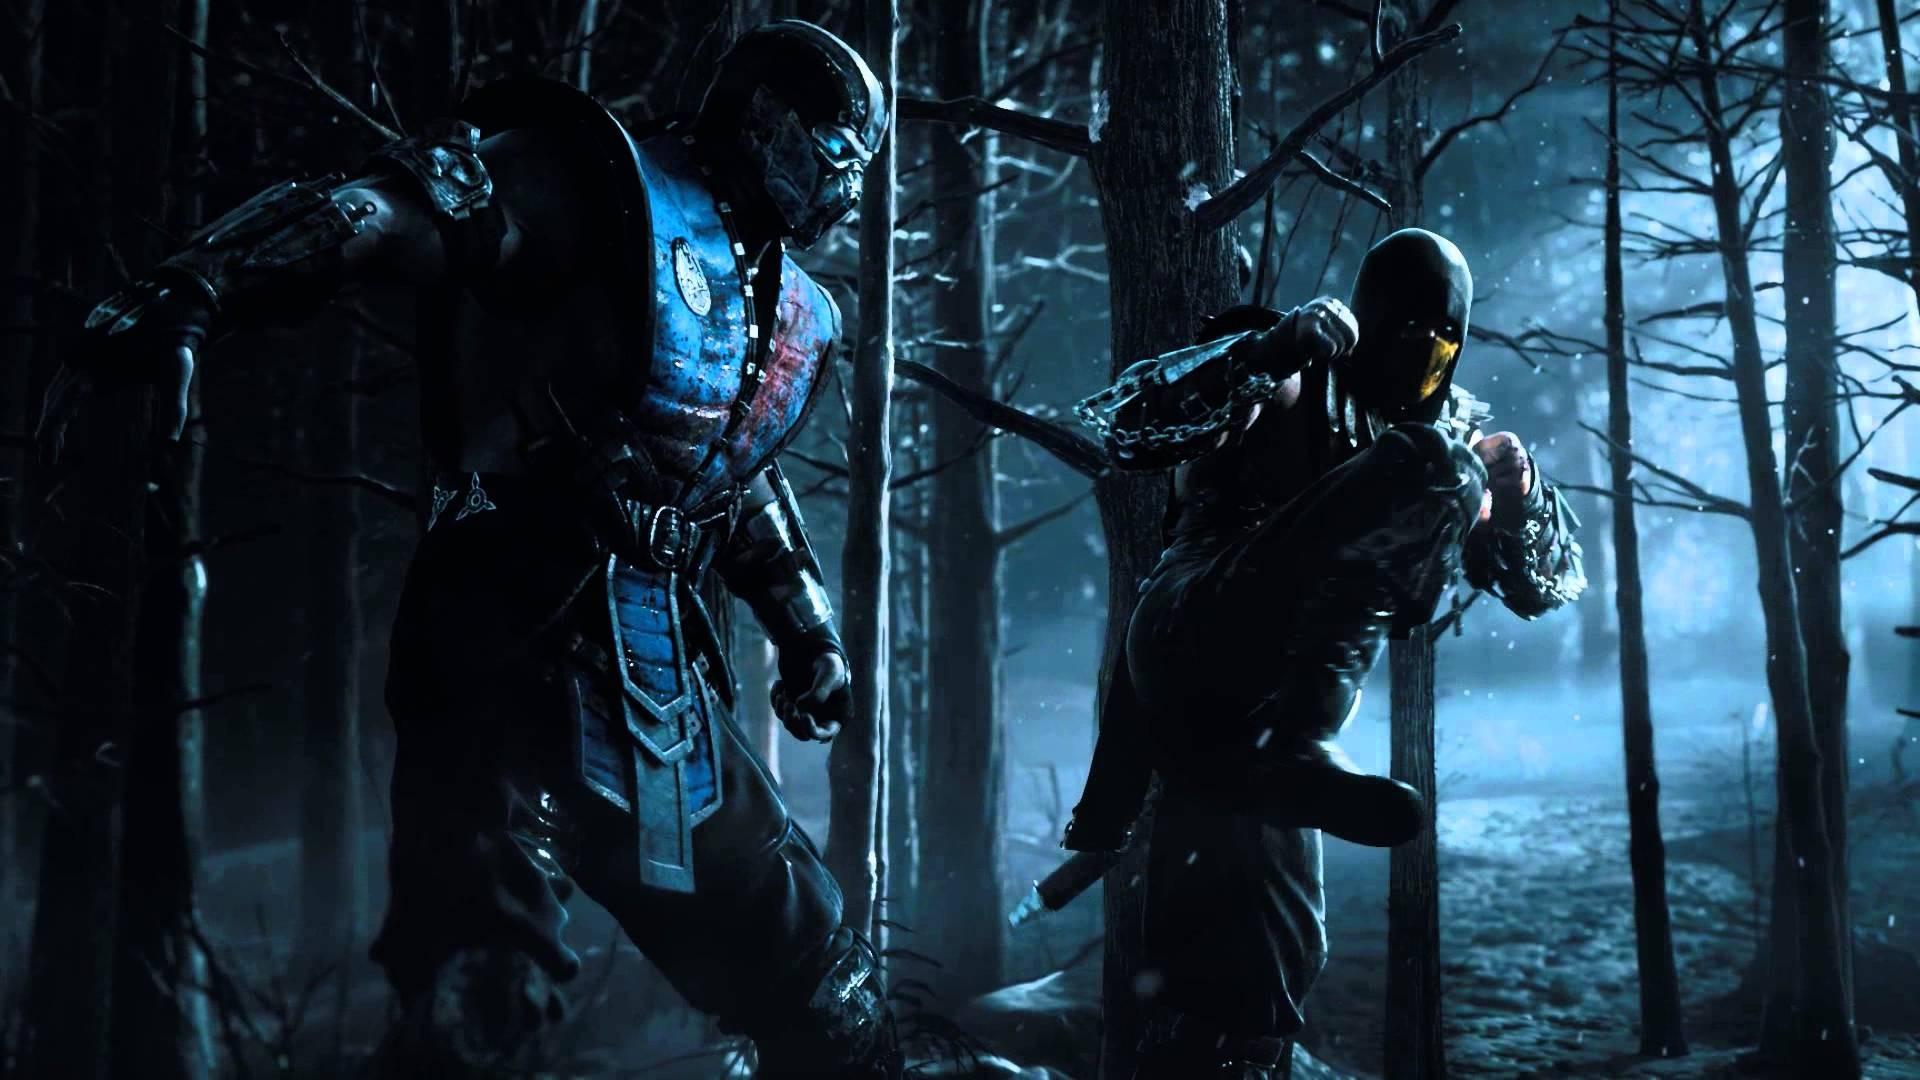 Mortal-Kombat-X-02.jpg